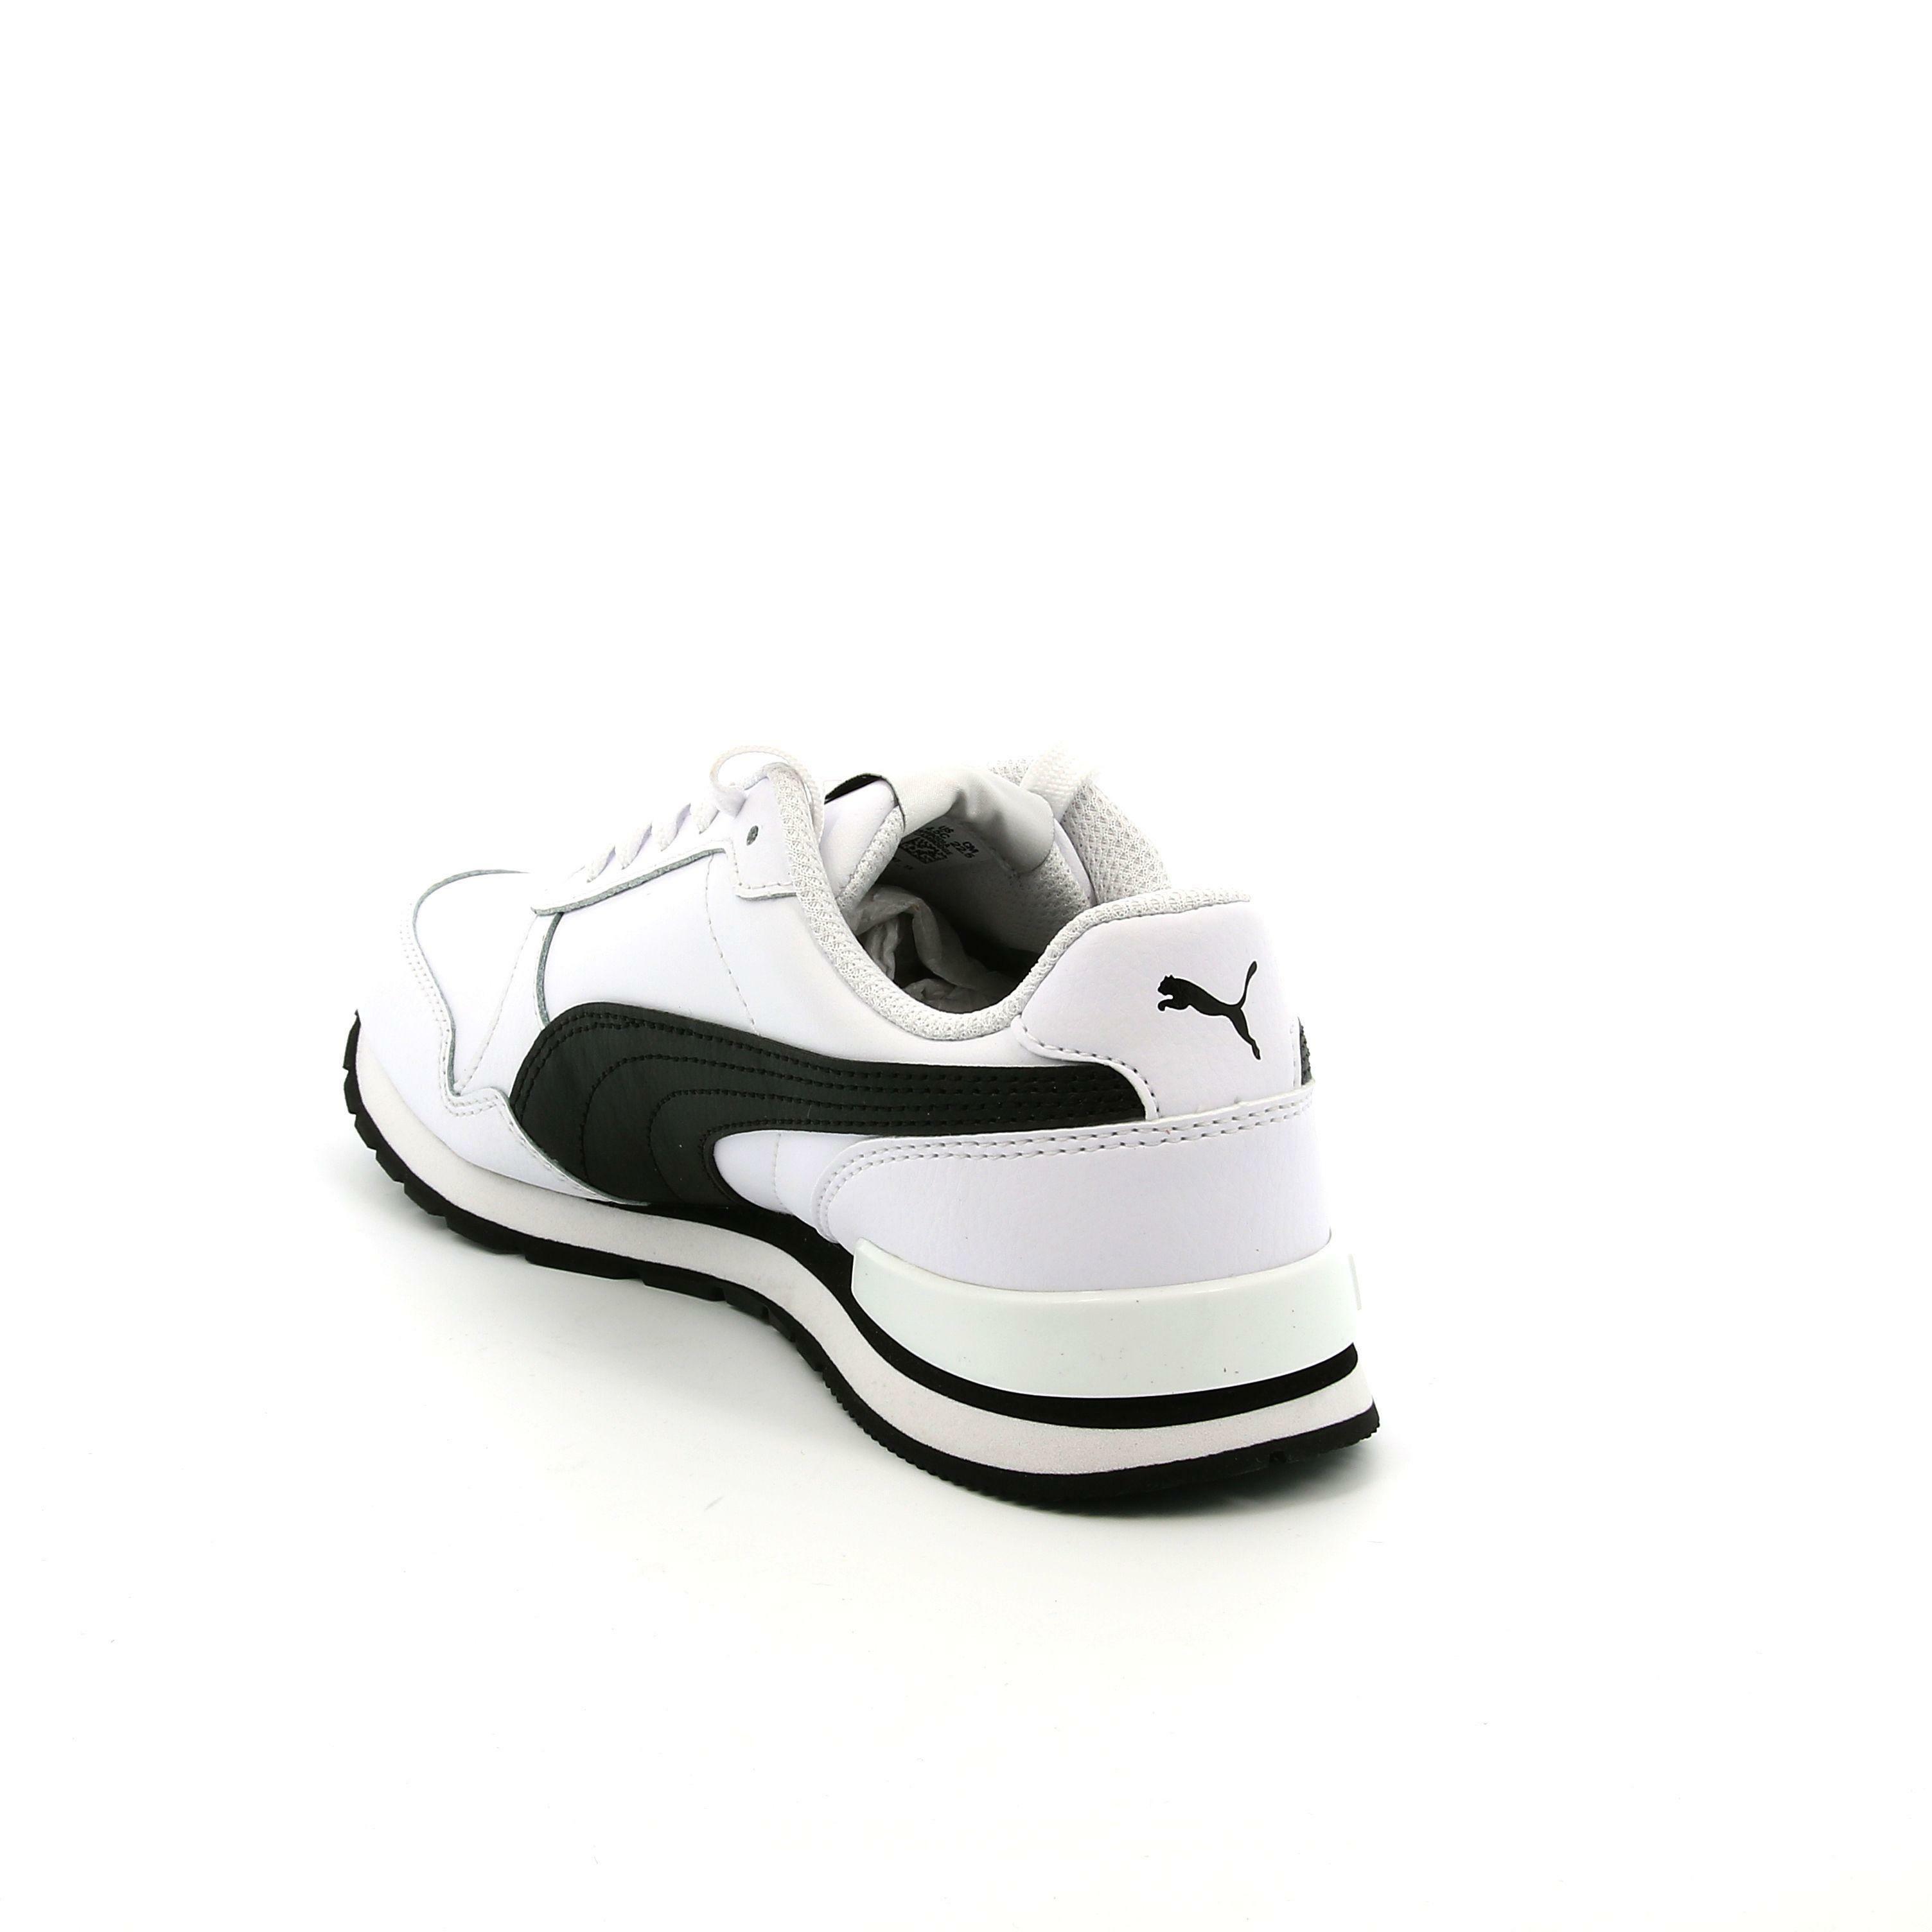 puma puma st runner v2 l jr unisex 366959 008 bianco scarpe sportive